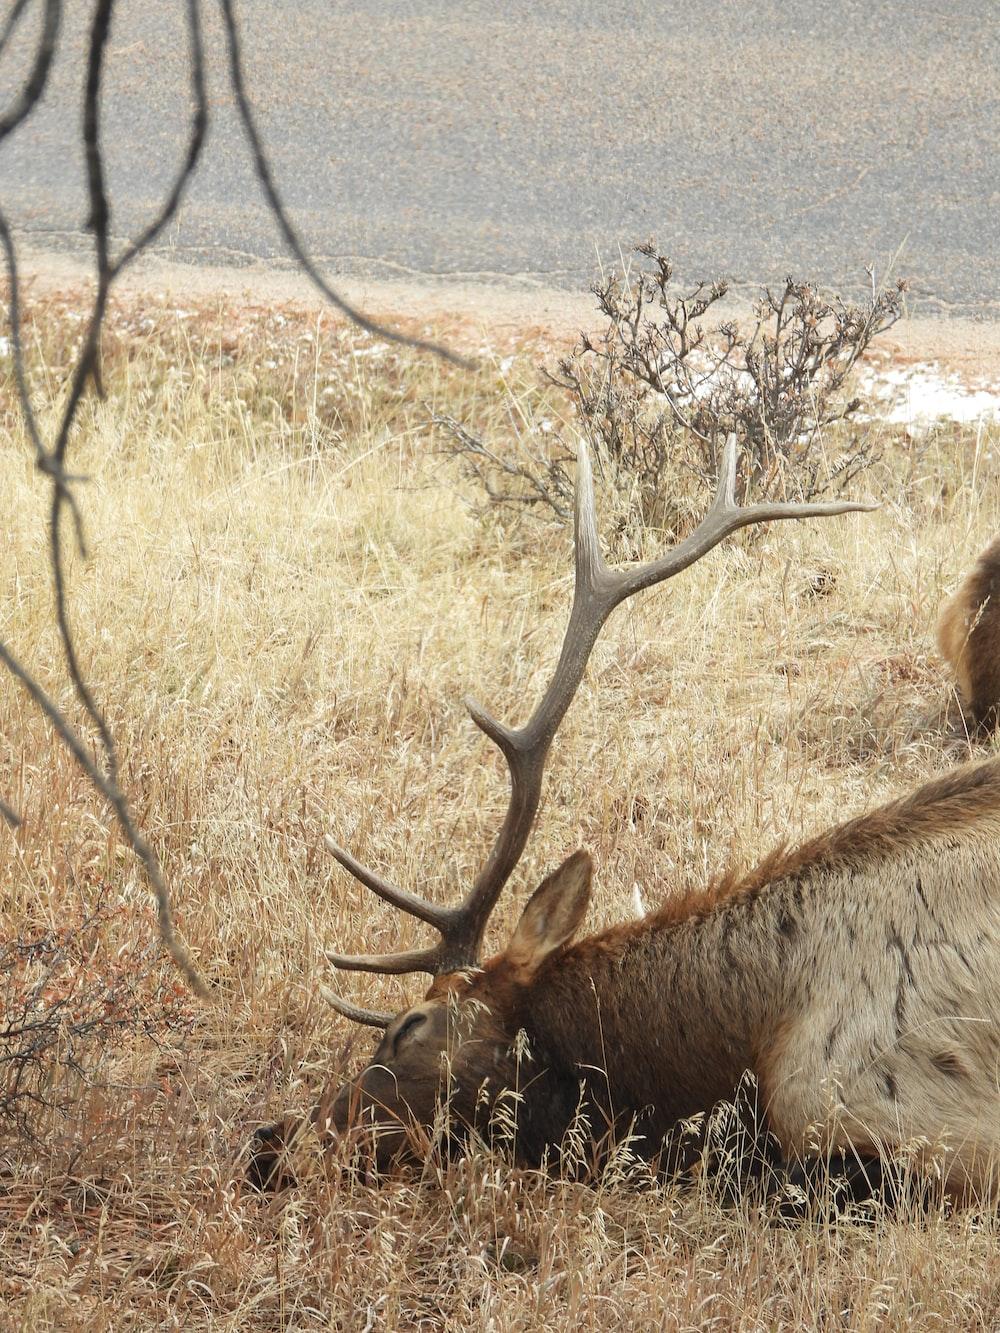 brown deer lying on brown grass during daytime